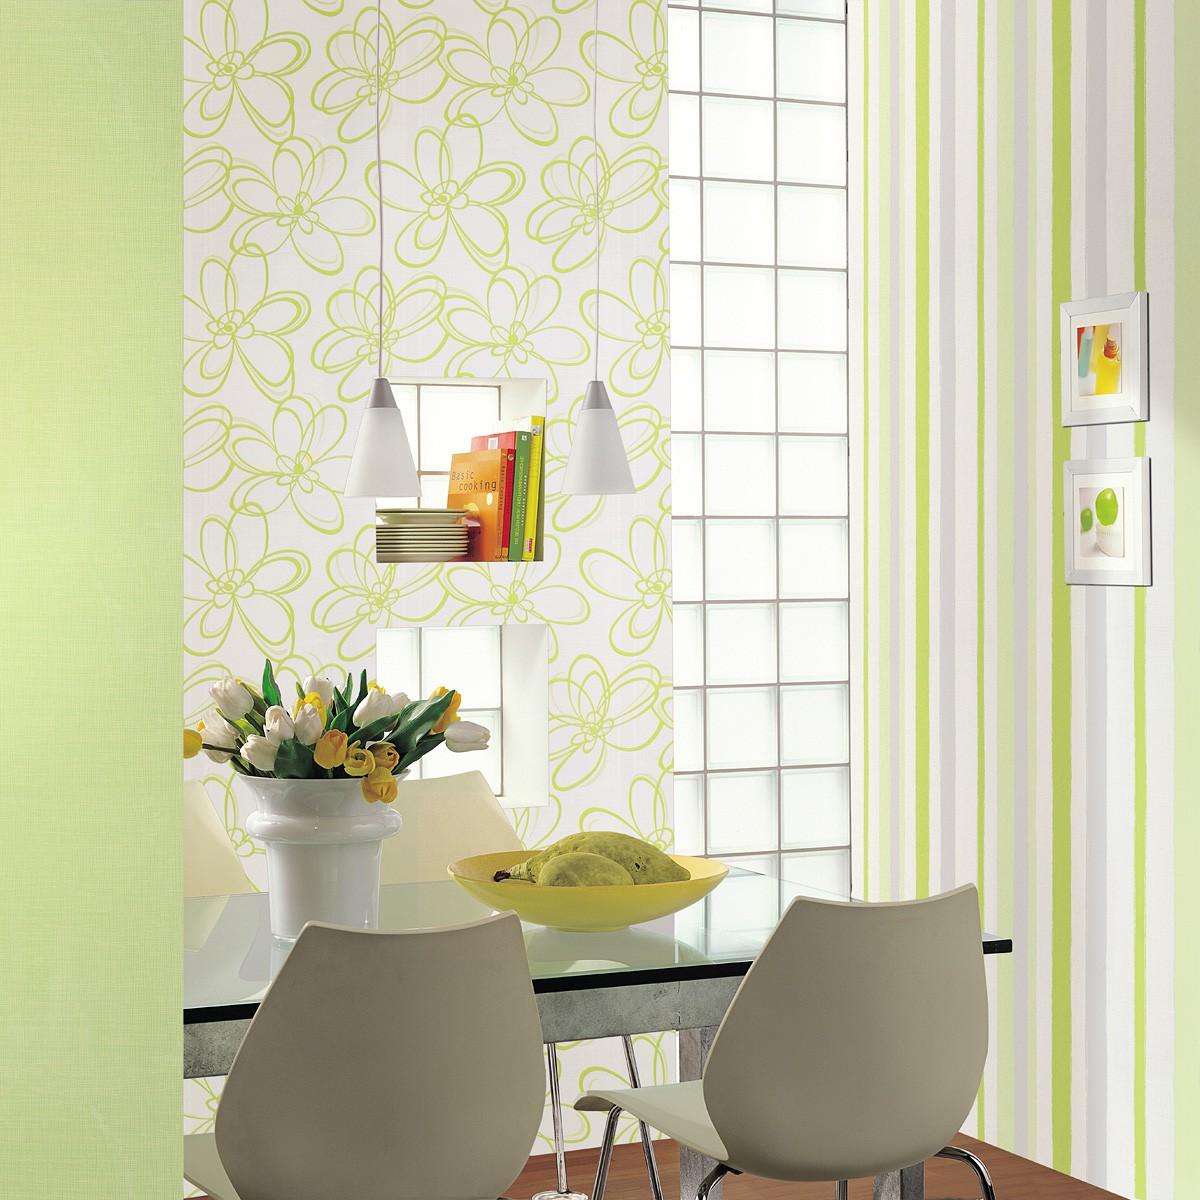 vliestapete muster wei tapeten marburg wohnsinn 55601. Black Bedroom Furniture Sets. Home Design Ideas